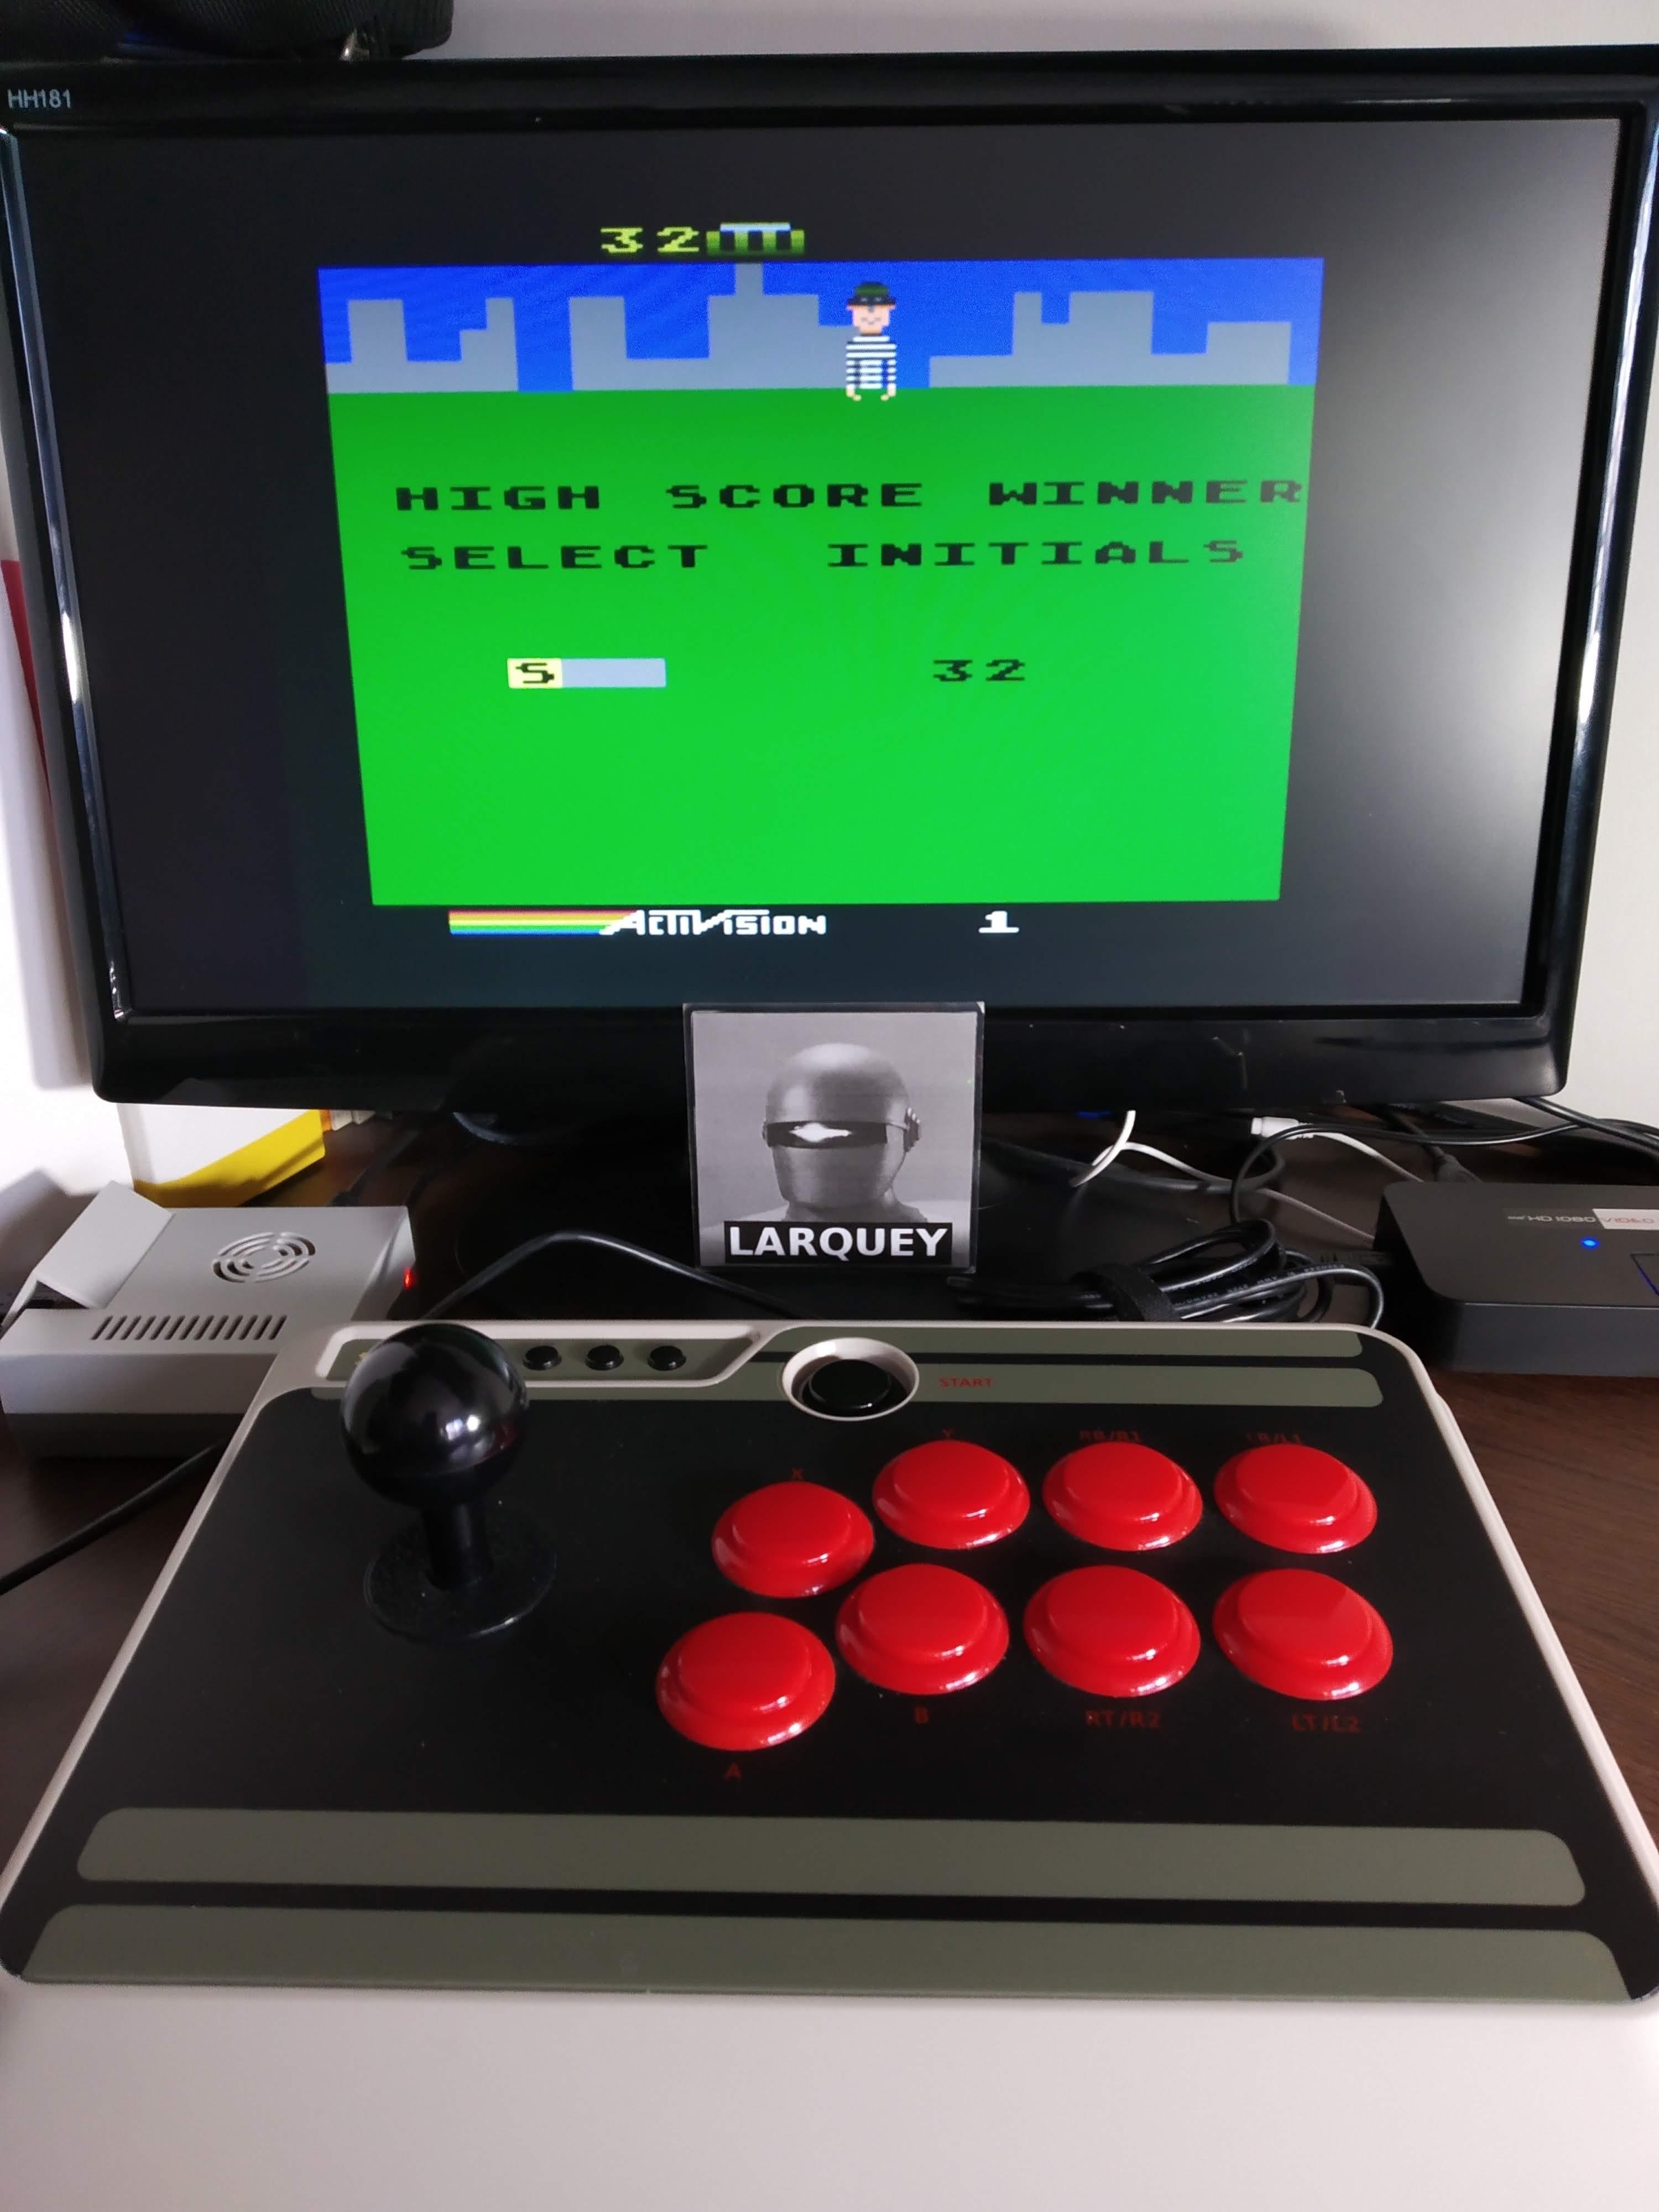 Larquey: Kaboom! (Atari 5200 Emulated) 32 points on 2019-11-16 09:22:05